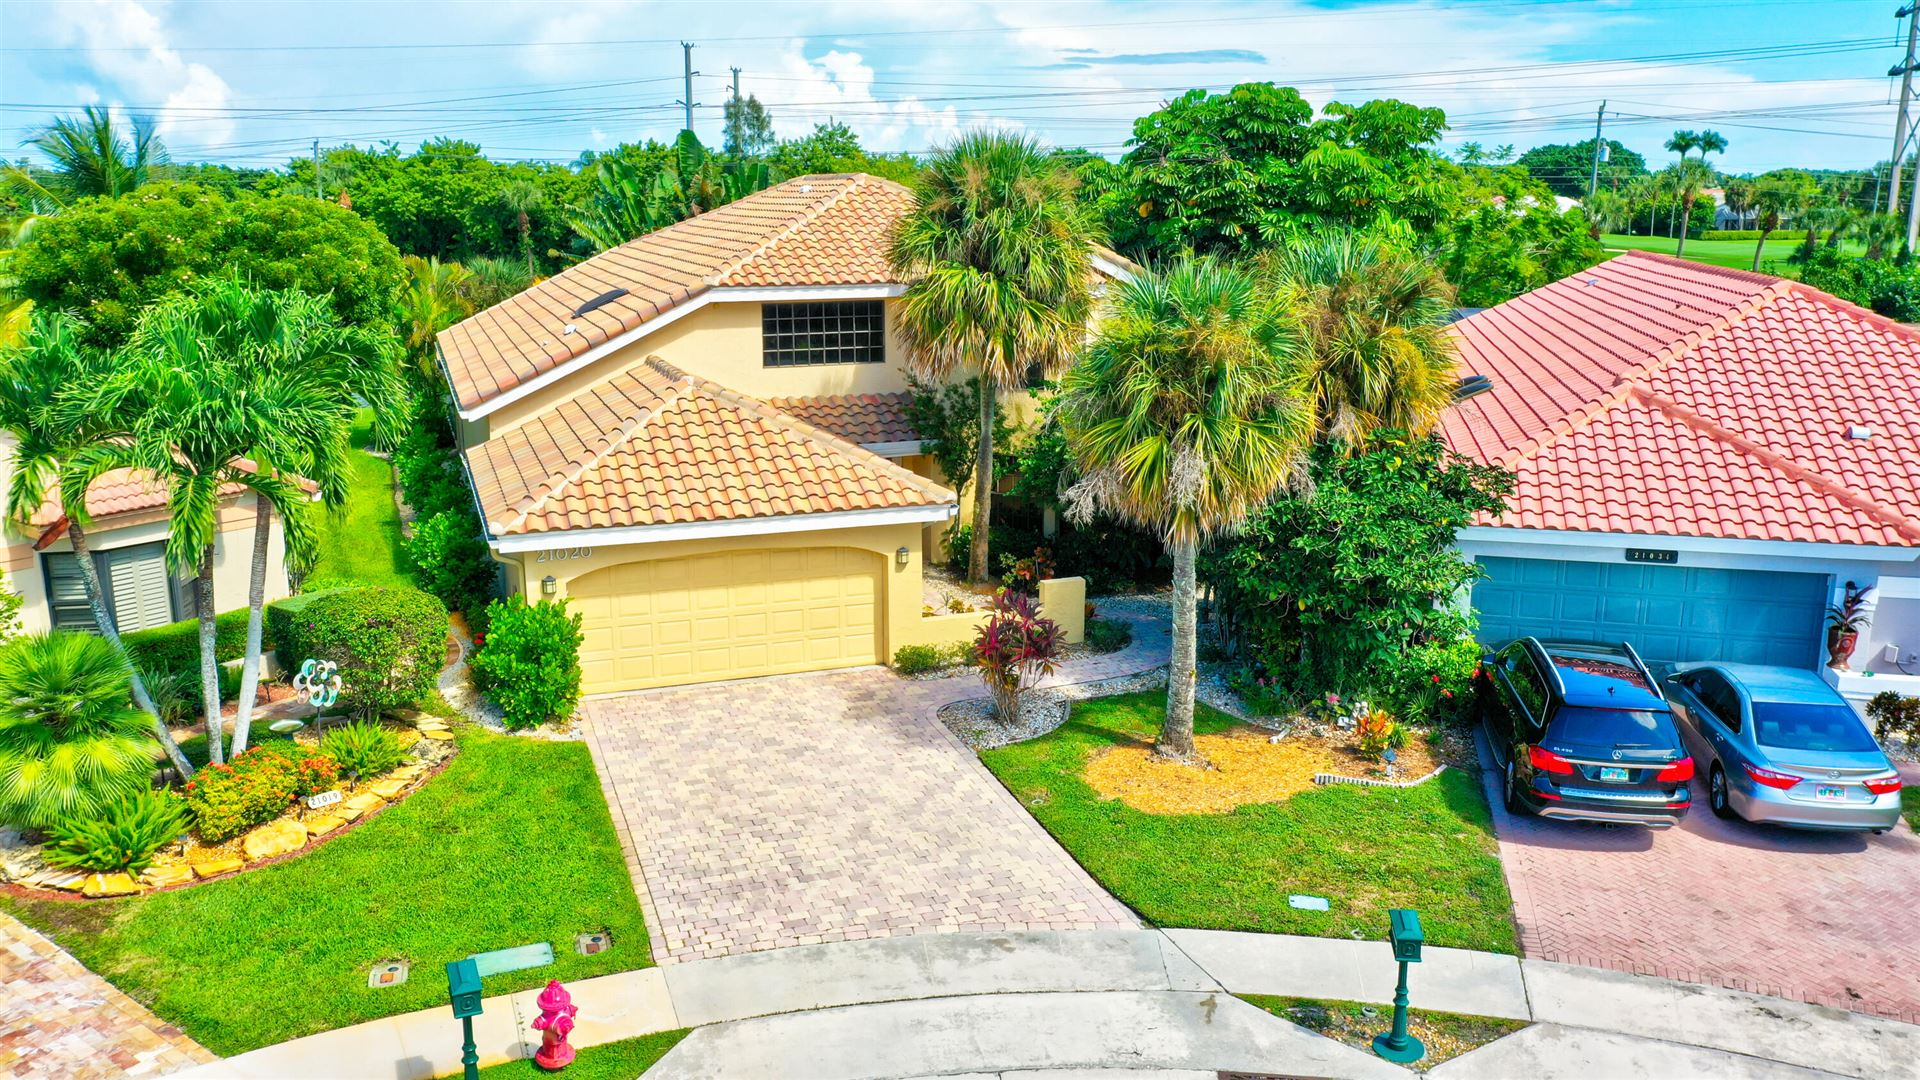 21020 Cottonwood Drive, Boca Raton, FL 33428 - MLS#: RX-10751965